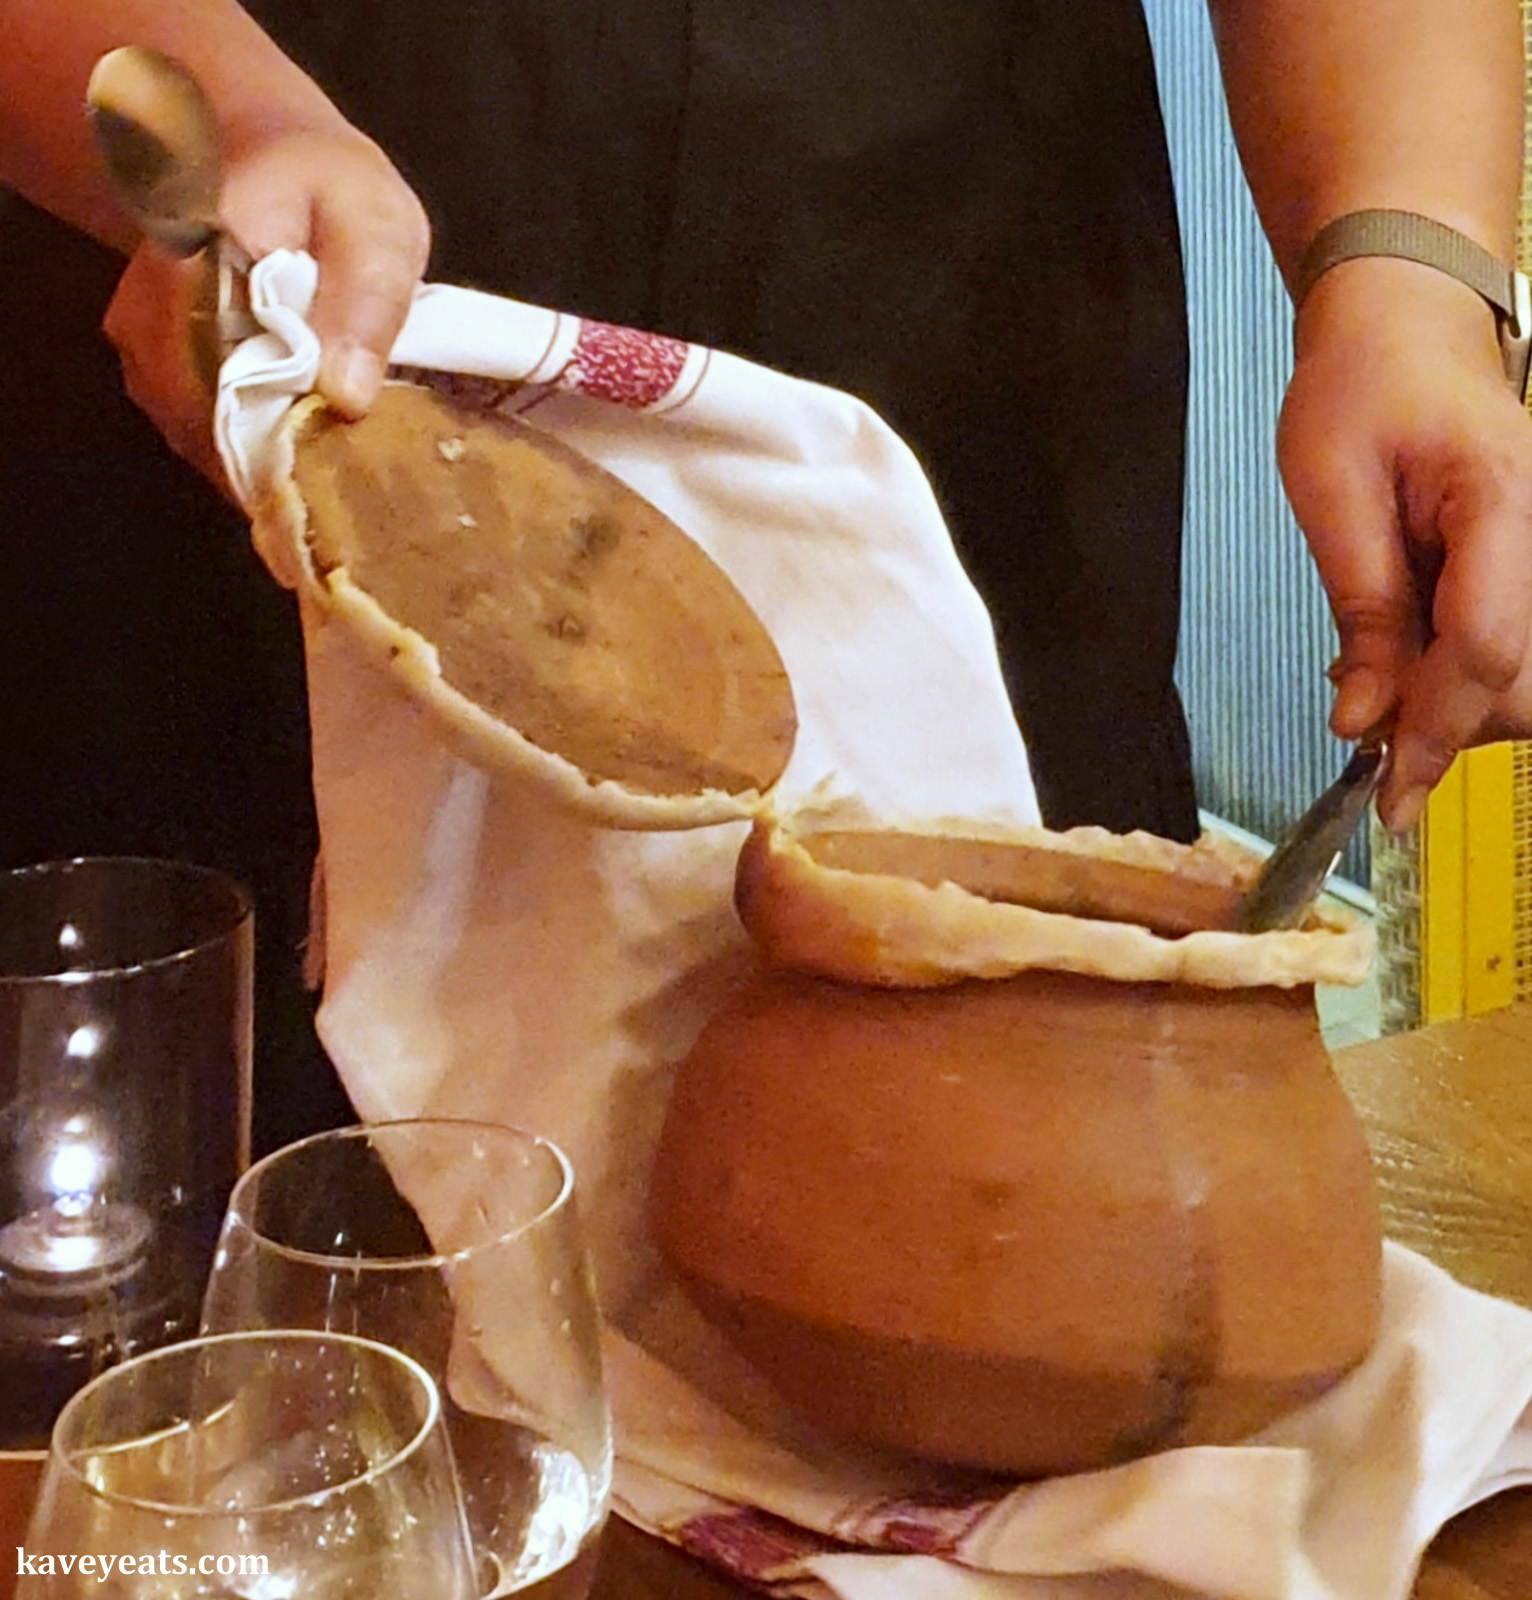 Claypot being opened